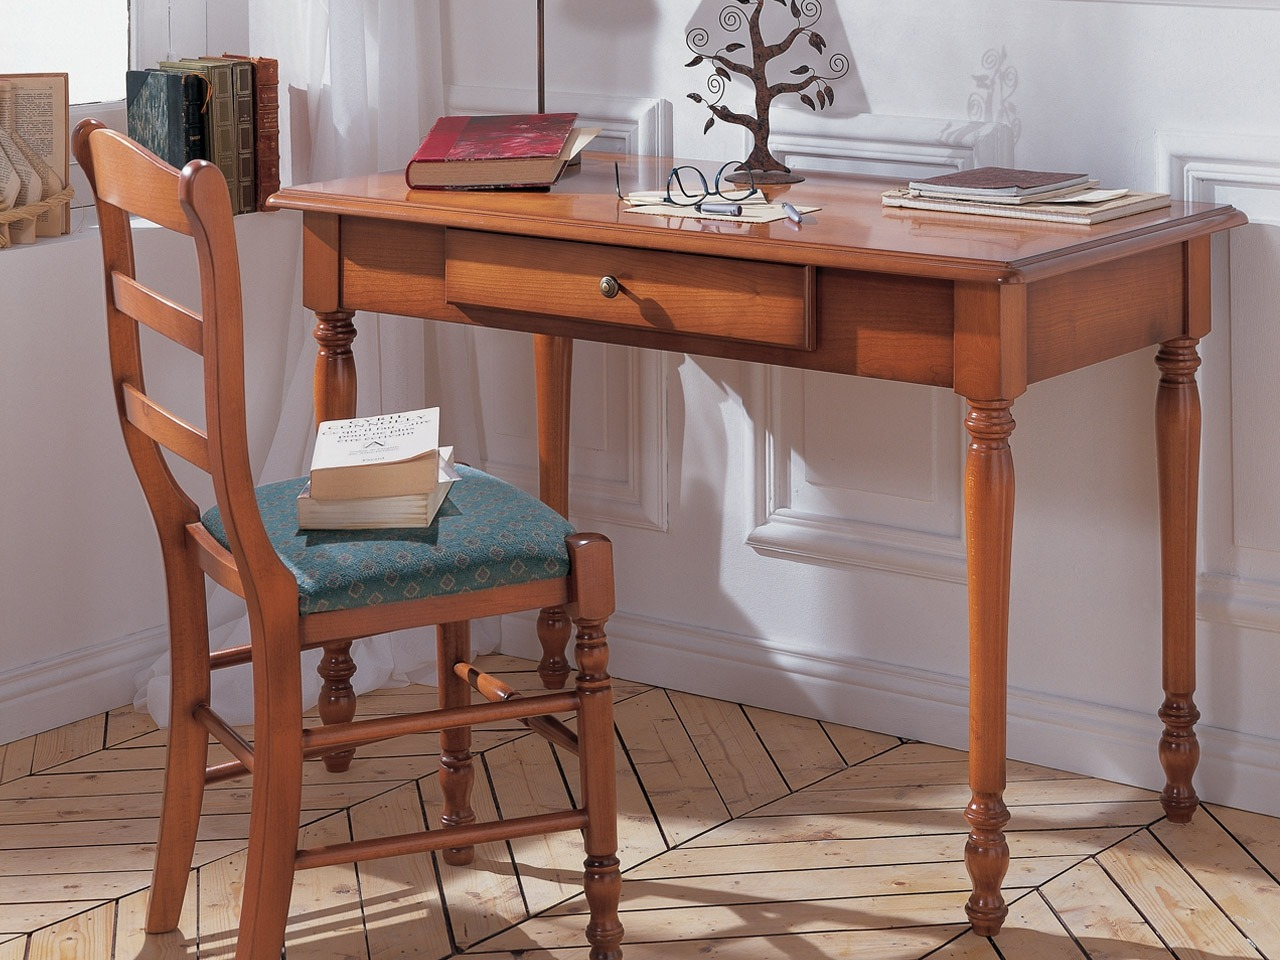 Bureau tiroir louis philippe meubles minet